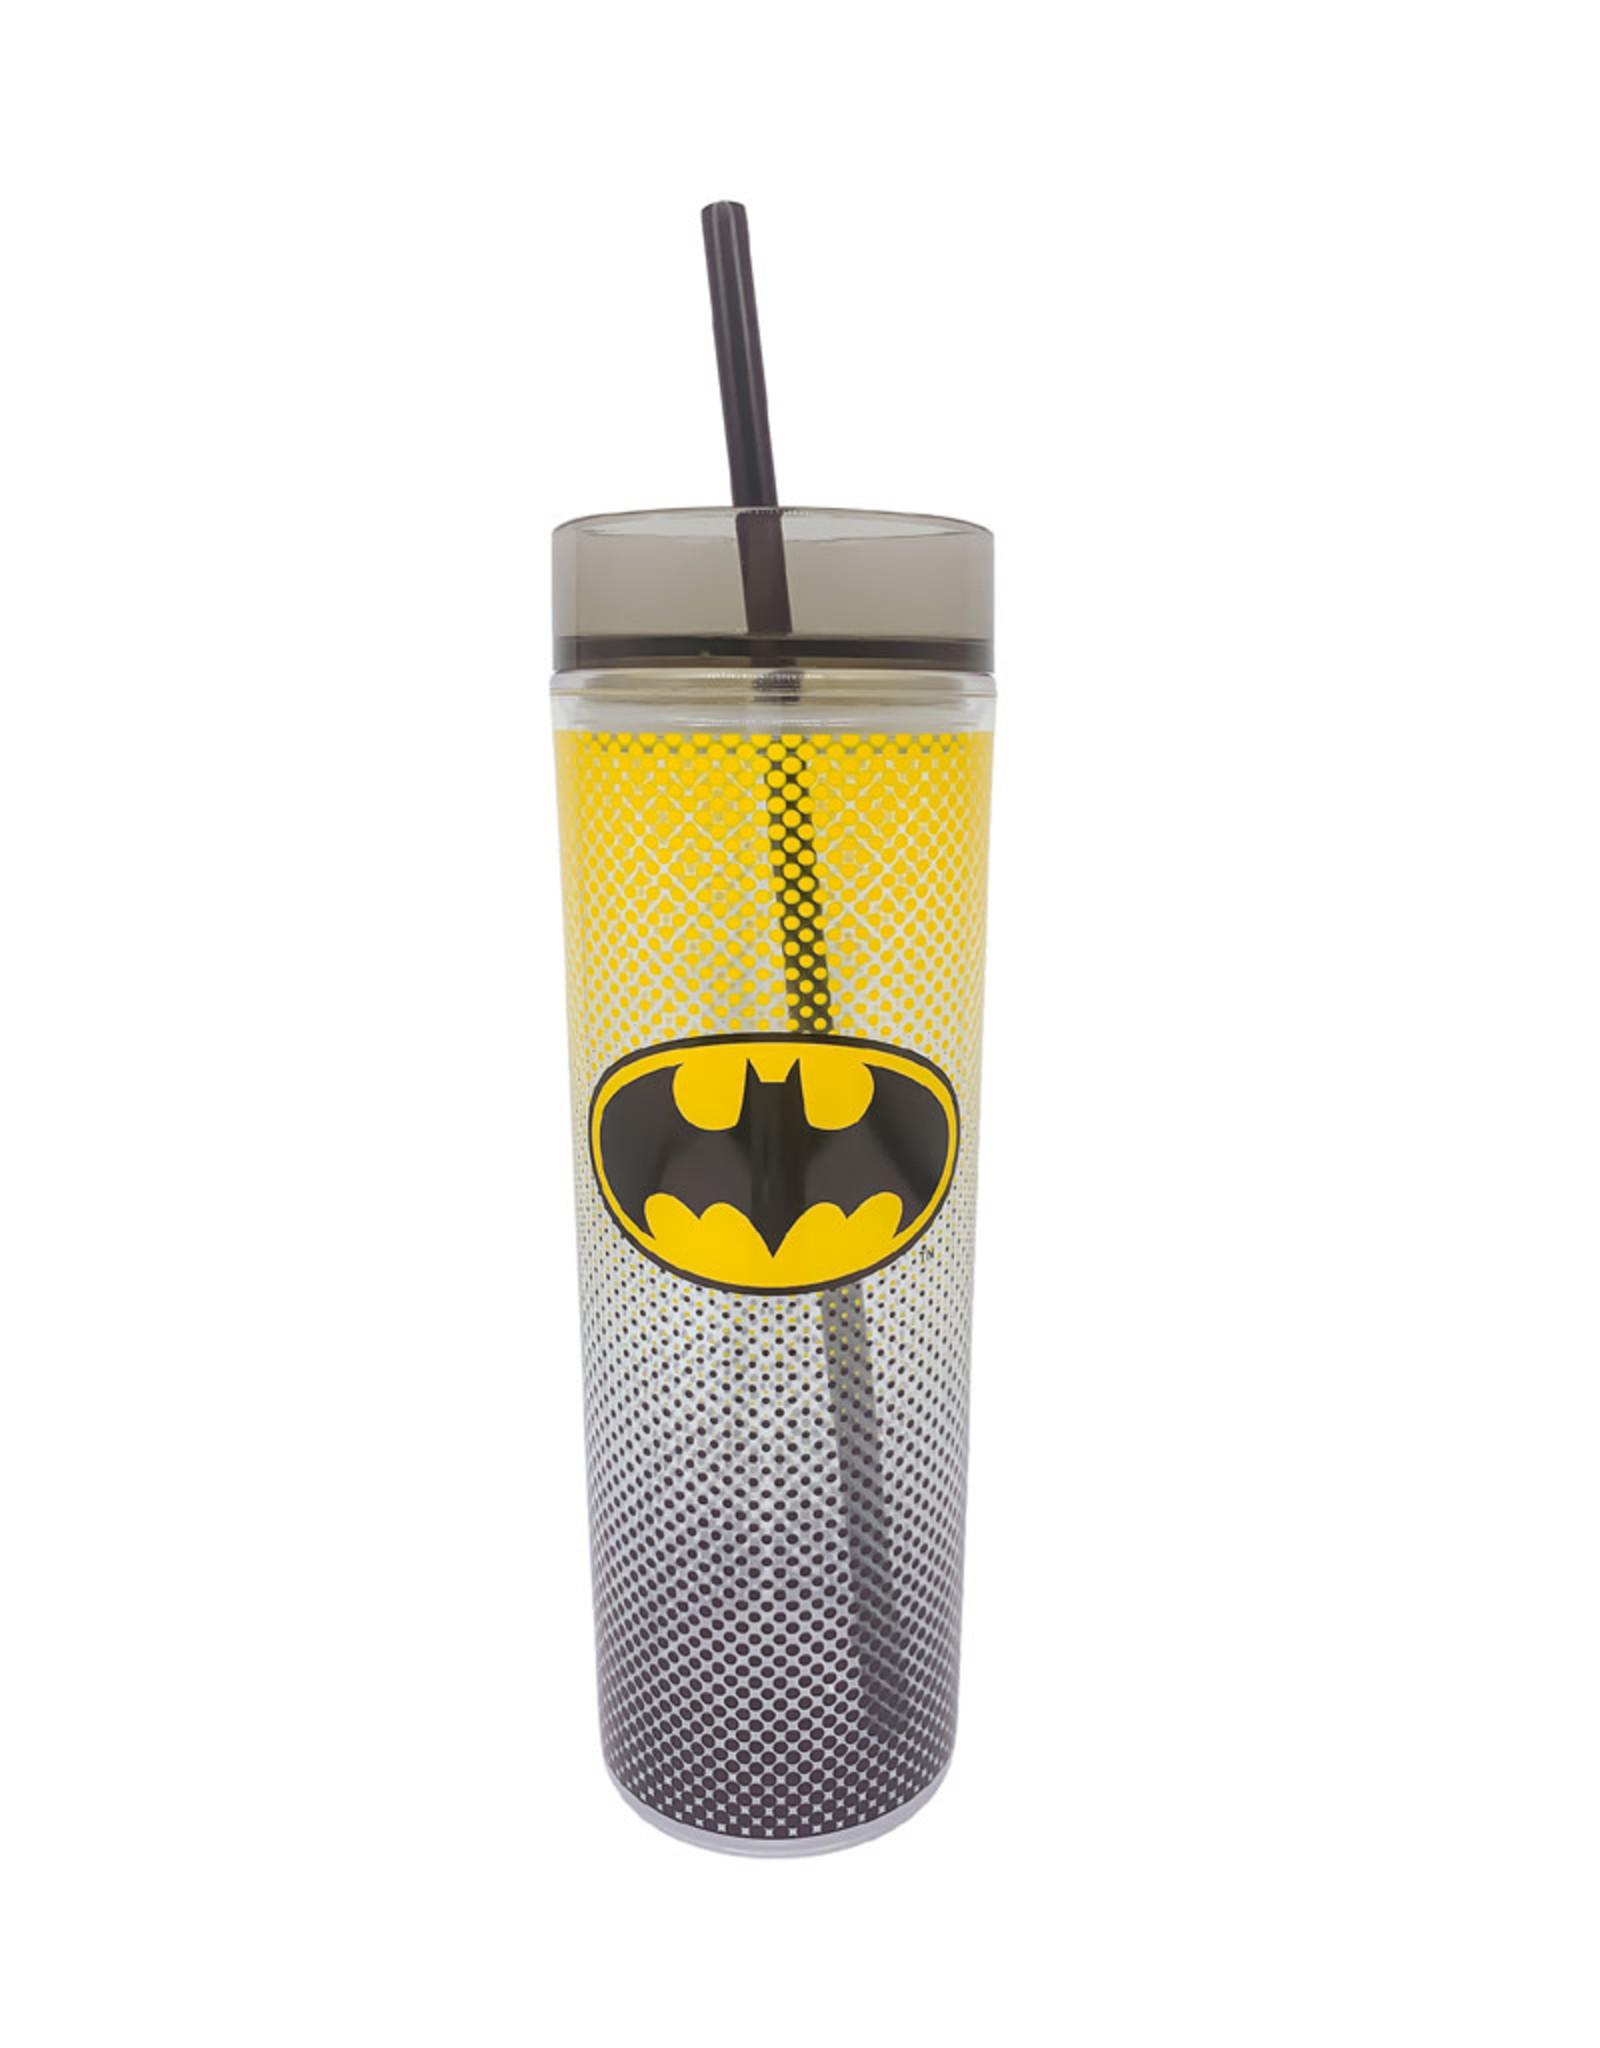 Dc Comics ( Acrylic Bottle with Straw ) Batman